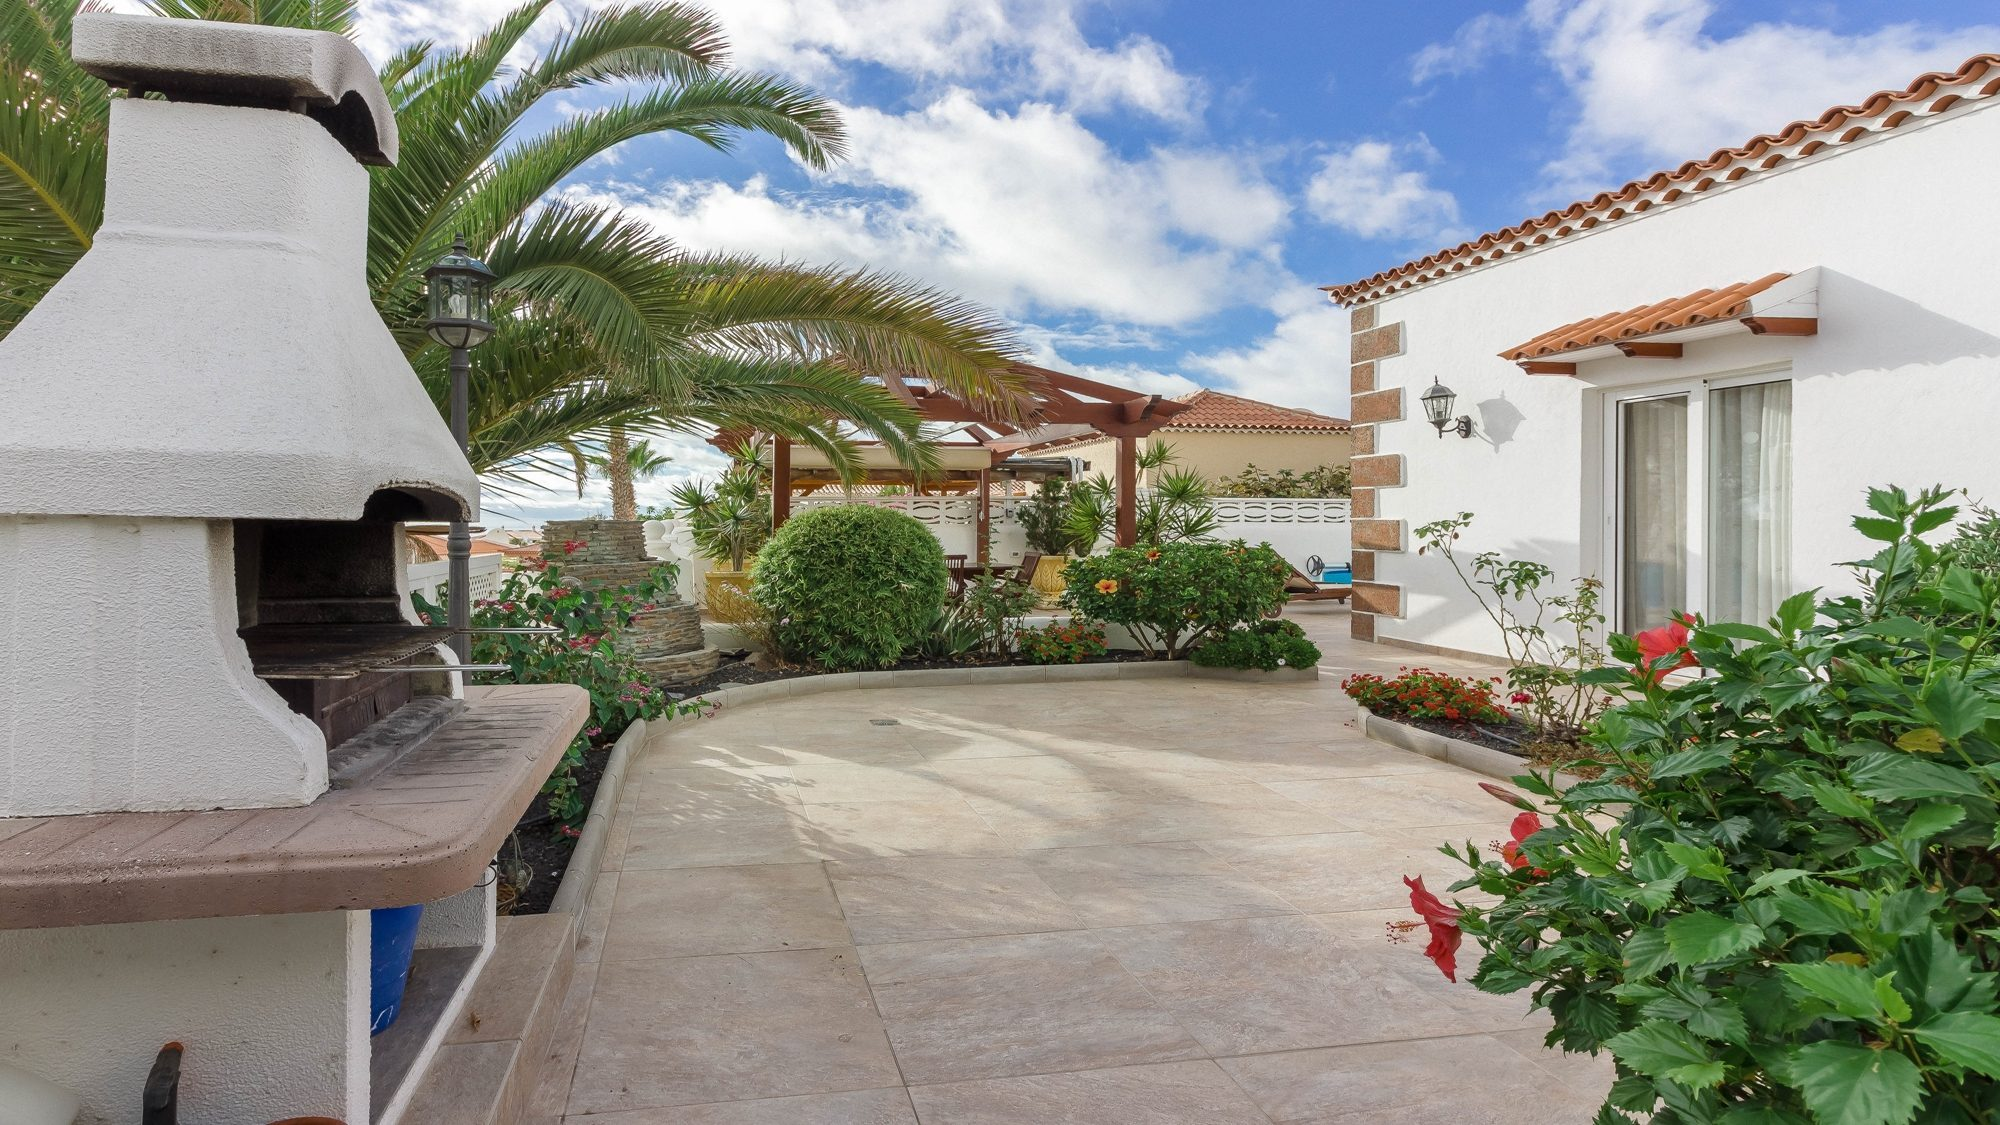 Villas in Tenerife to rent  4 Bedroom villa Tenerife  Callao Salvaje